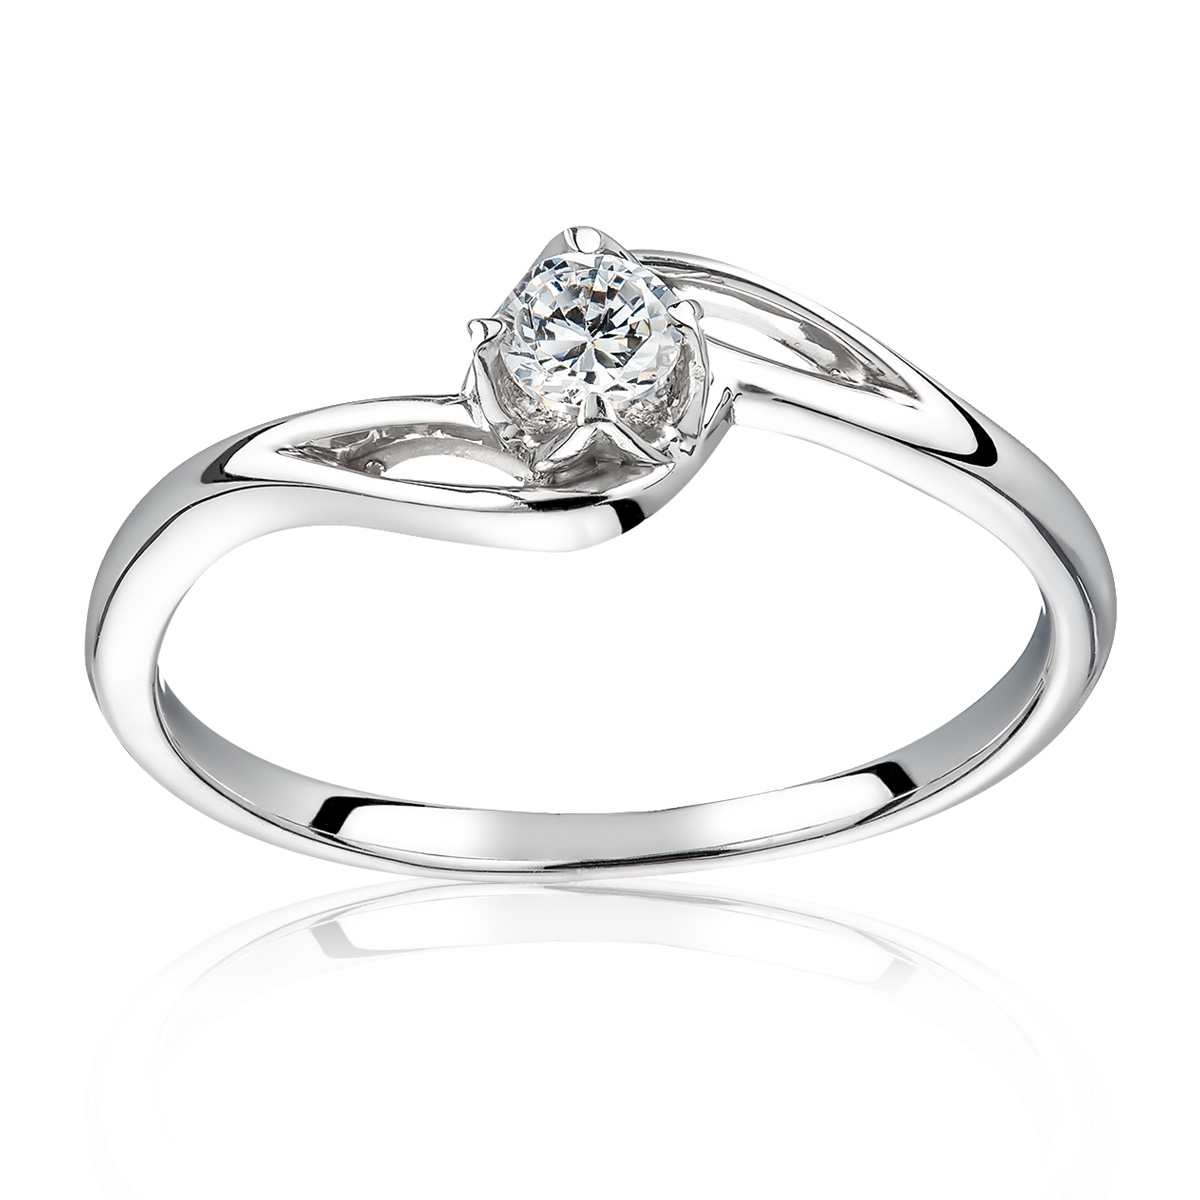 Заручальне кольцо з діамантом 0.15 карат «Крапля роси»